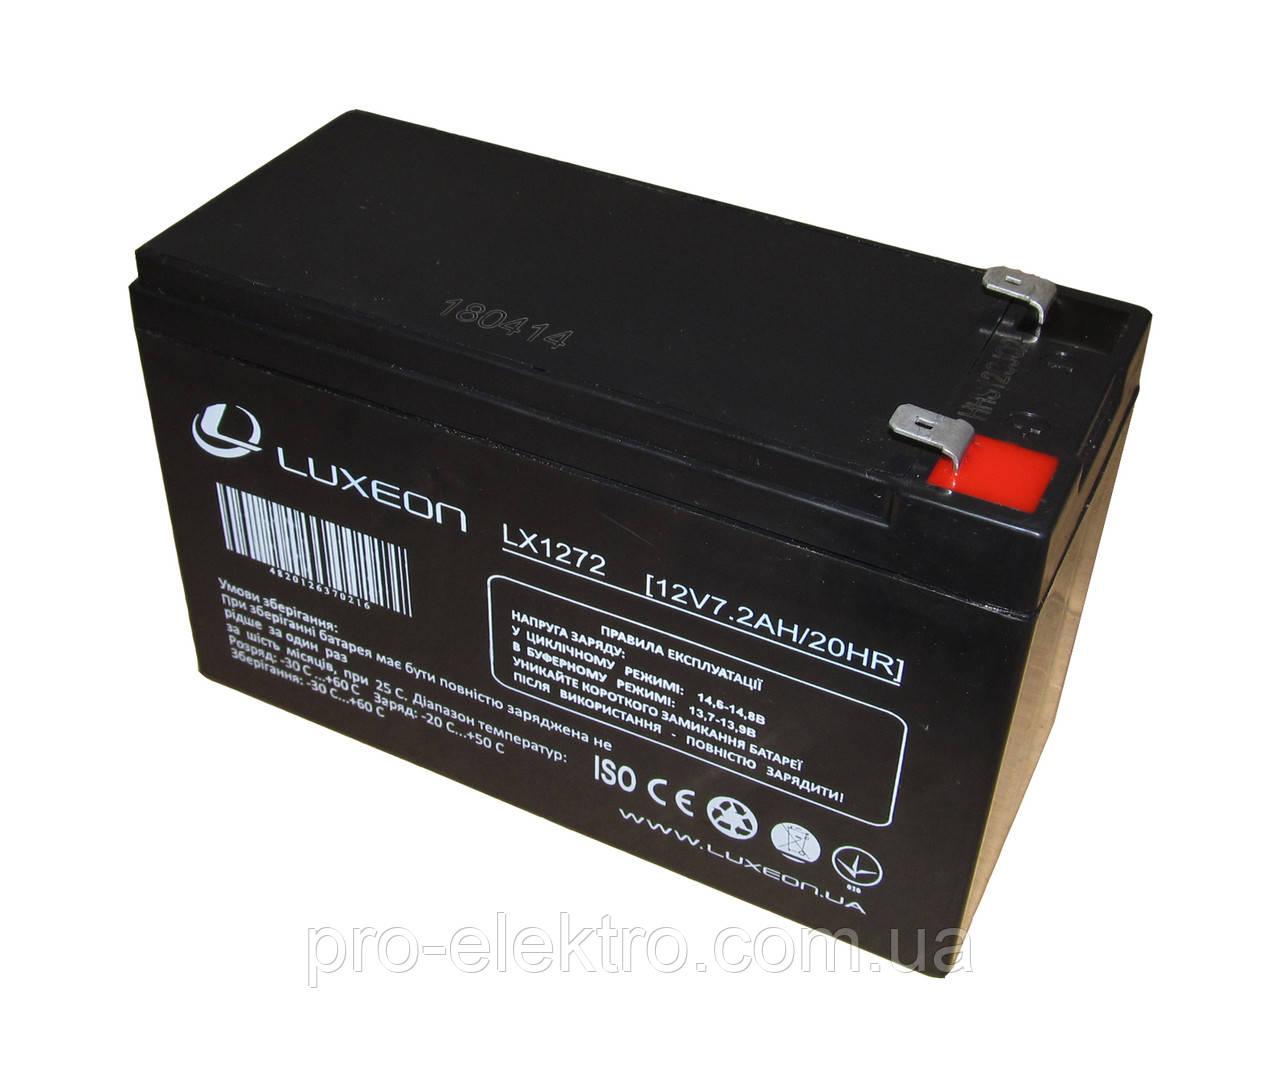 Аккумуляторная батарея LUXEON LX 1272